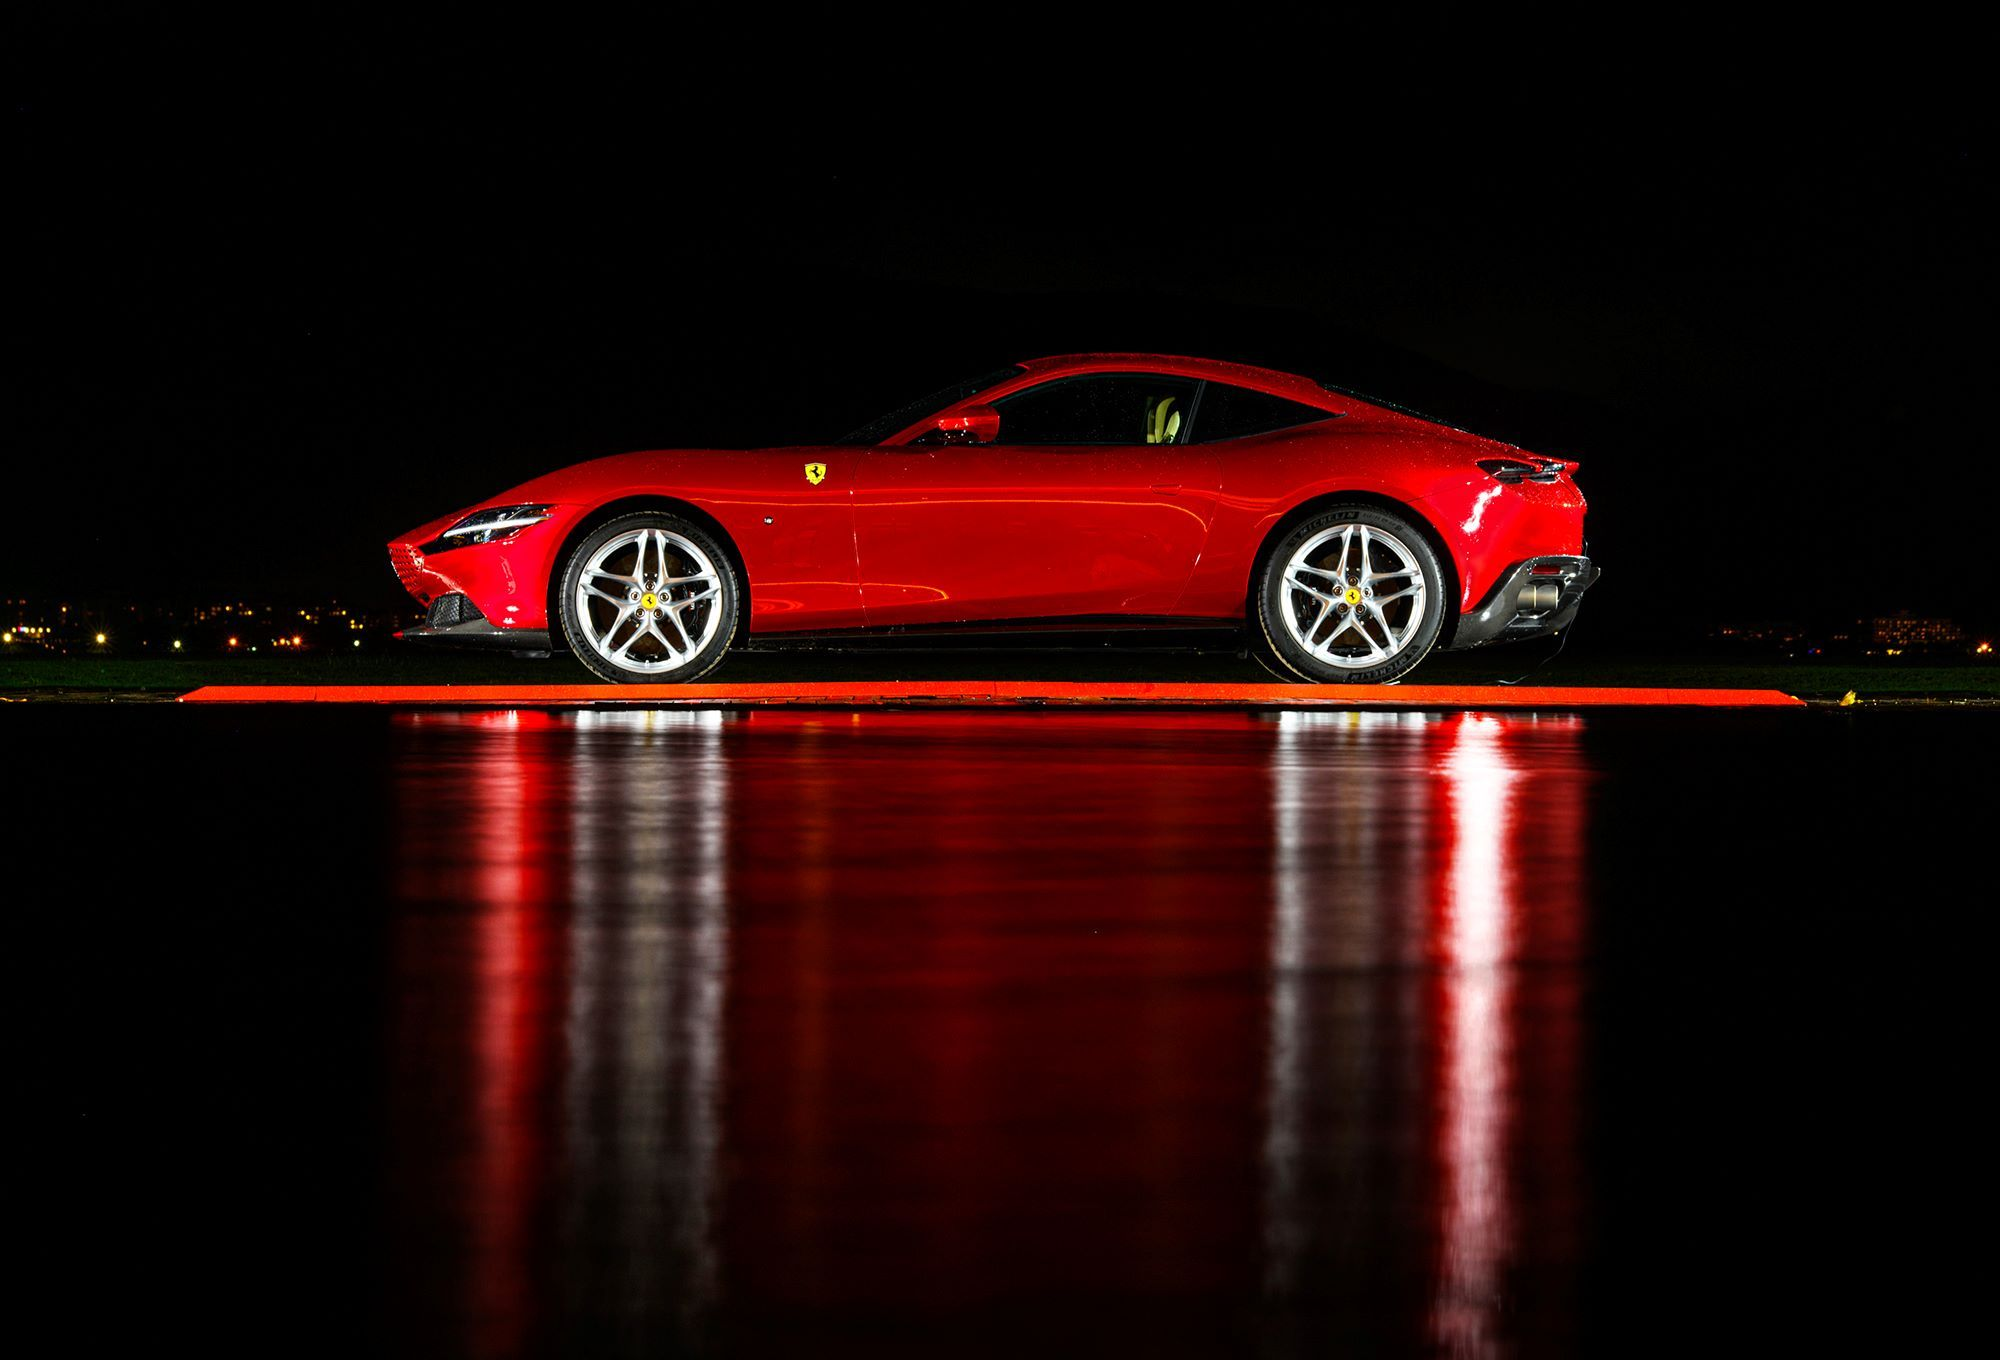 Ferrari Roma奪下2020汽車設計大獎!這台「身披晚禮服的F1賽車」的優雅設計無庸置疑